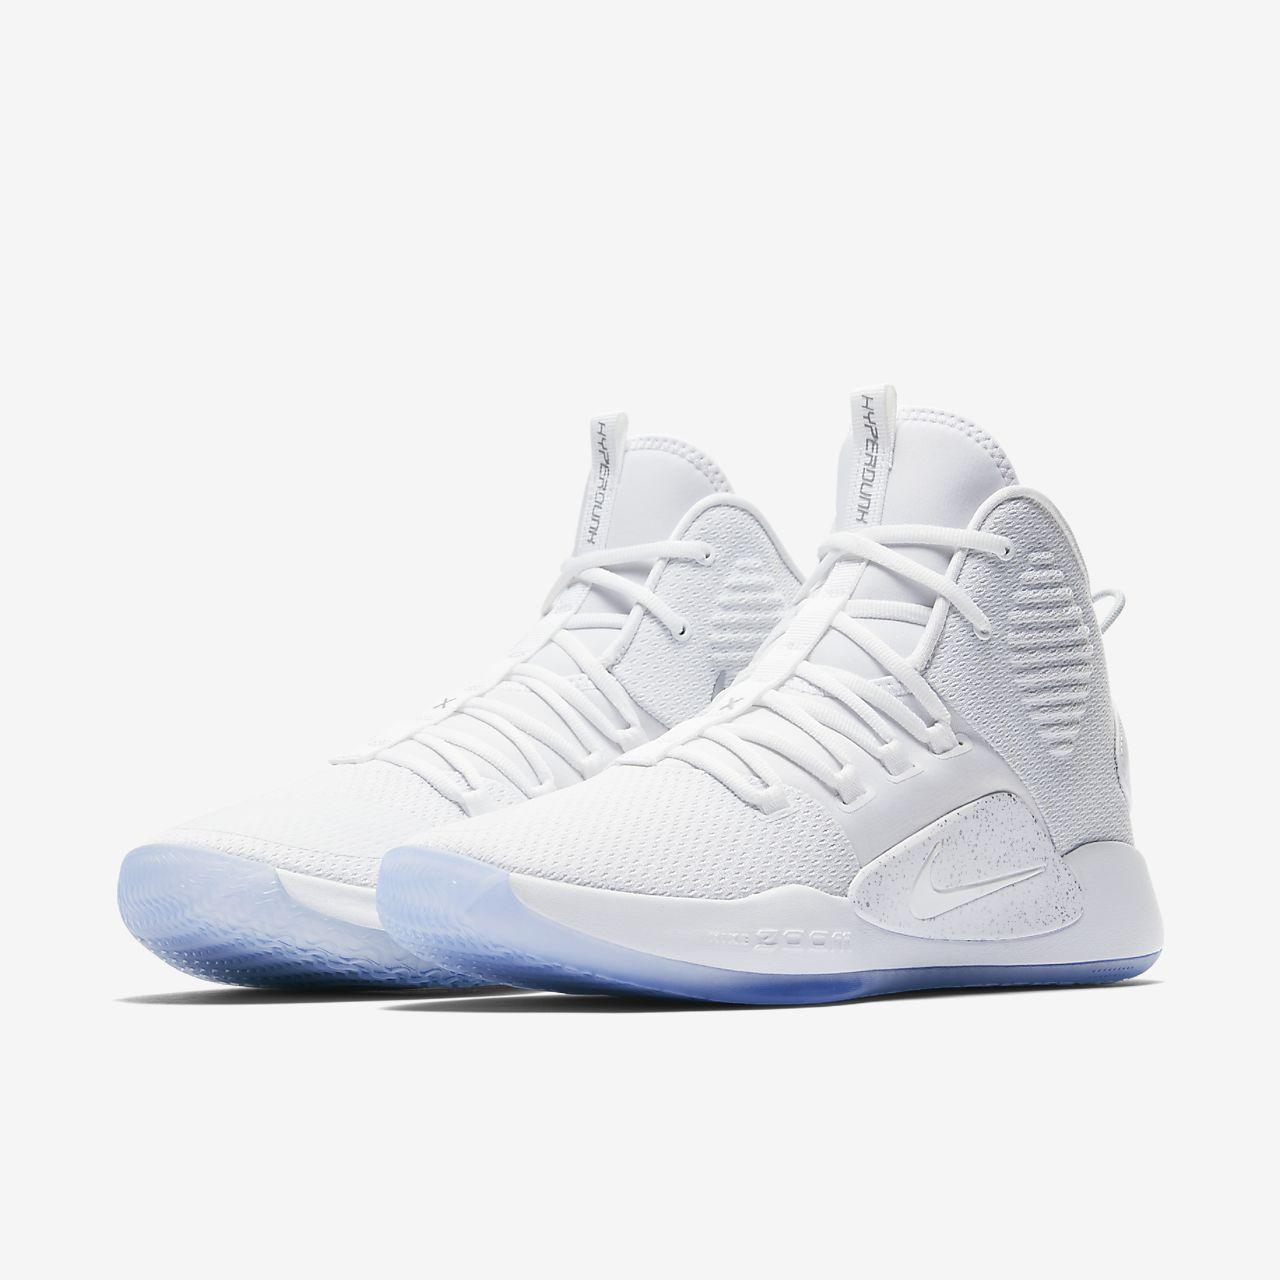 d2368a70a7c9 Nike Hyperdunk X Basketball Shoe. Nike.com ZA